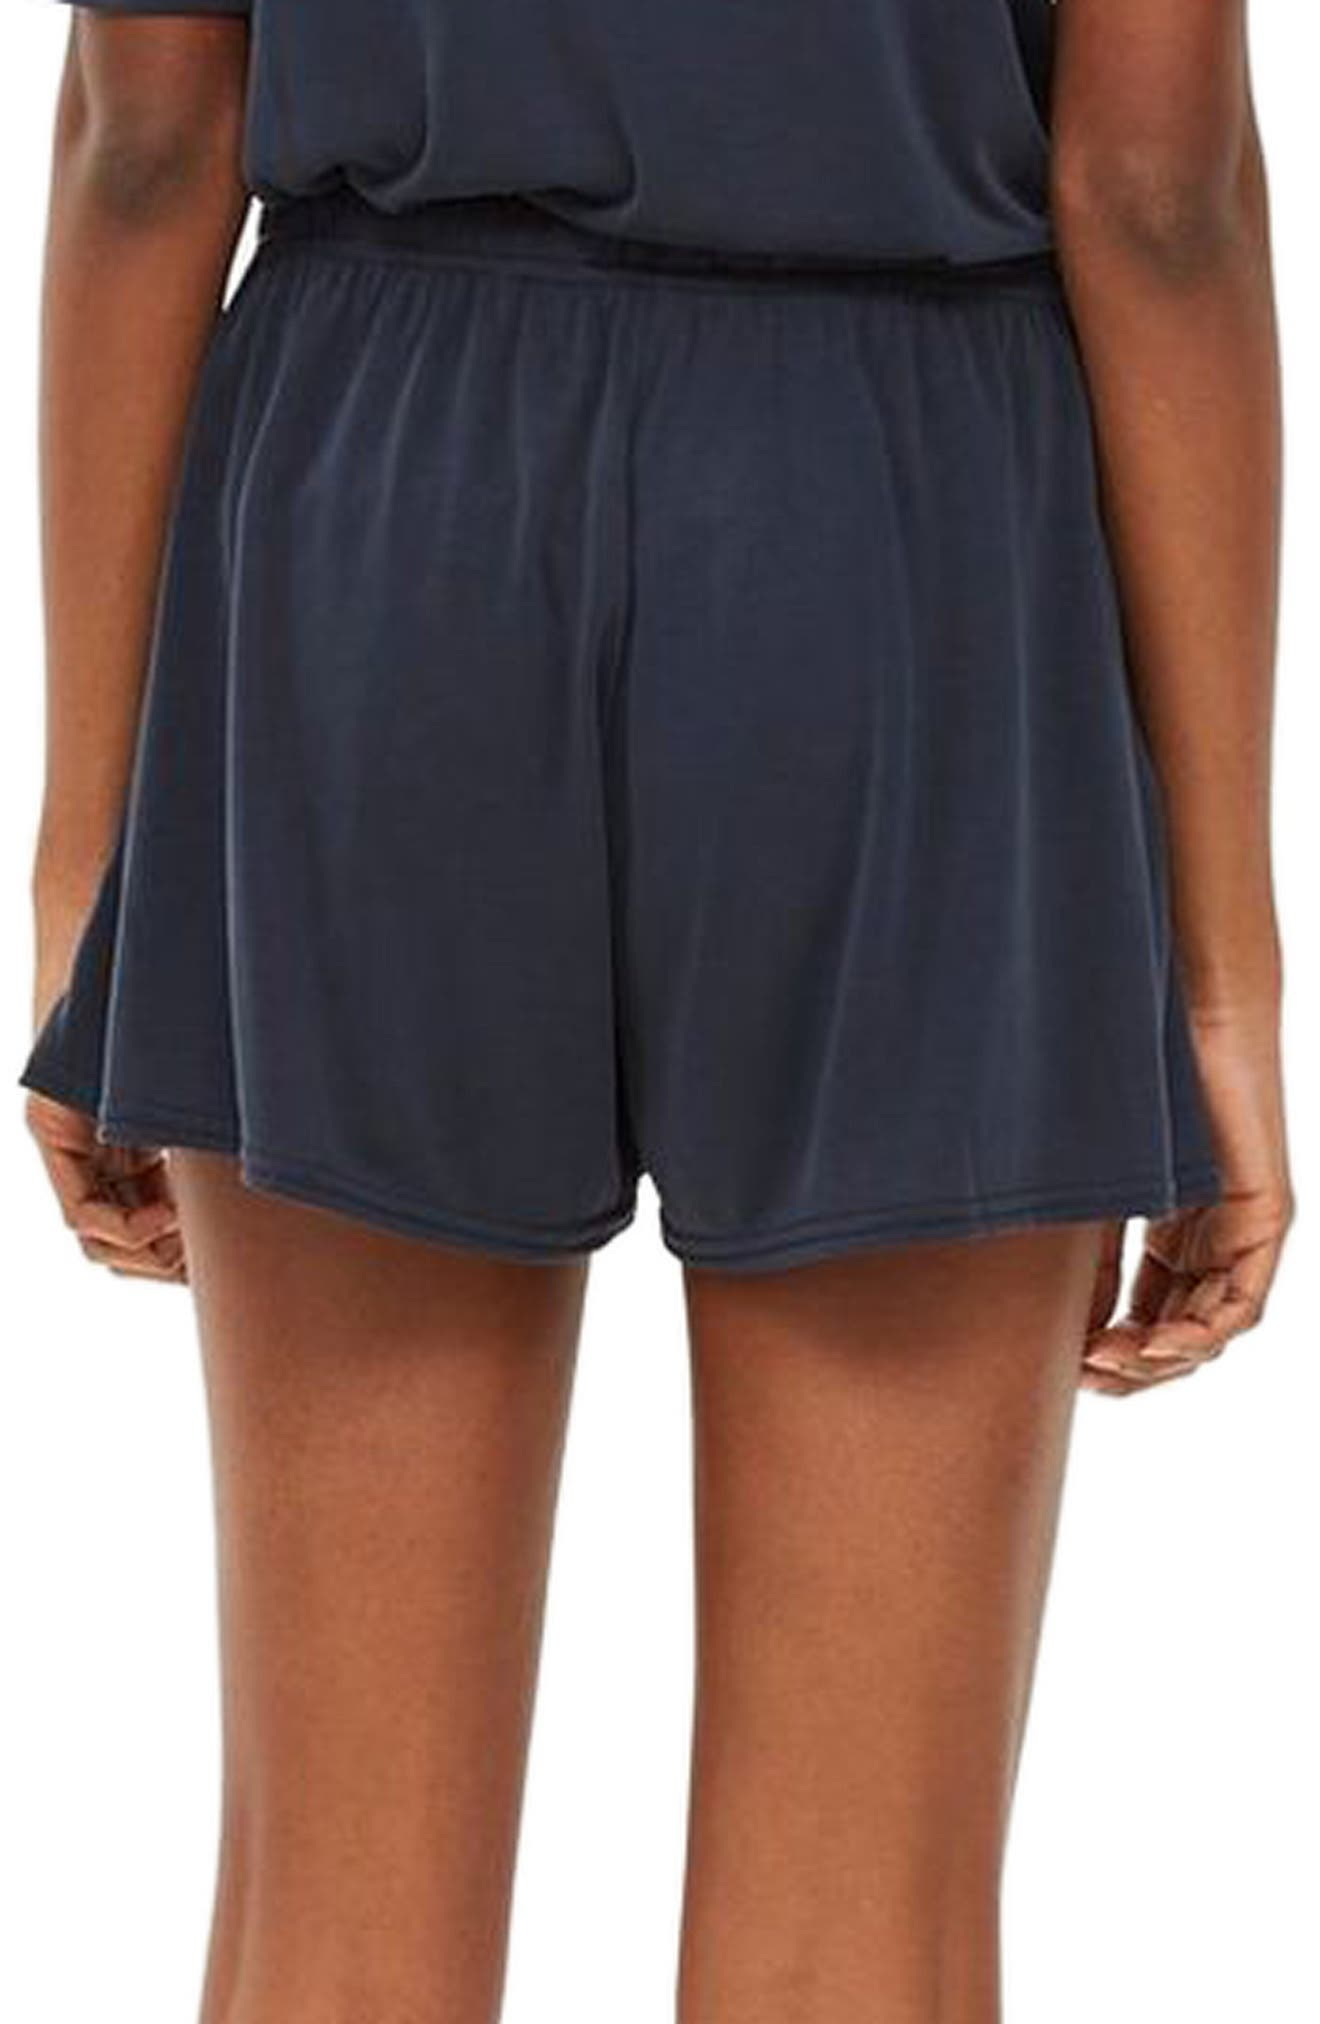 Lounge Shorts,                             Alternate thumbnail 2, color,                             NAVY BLUE